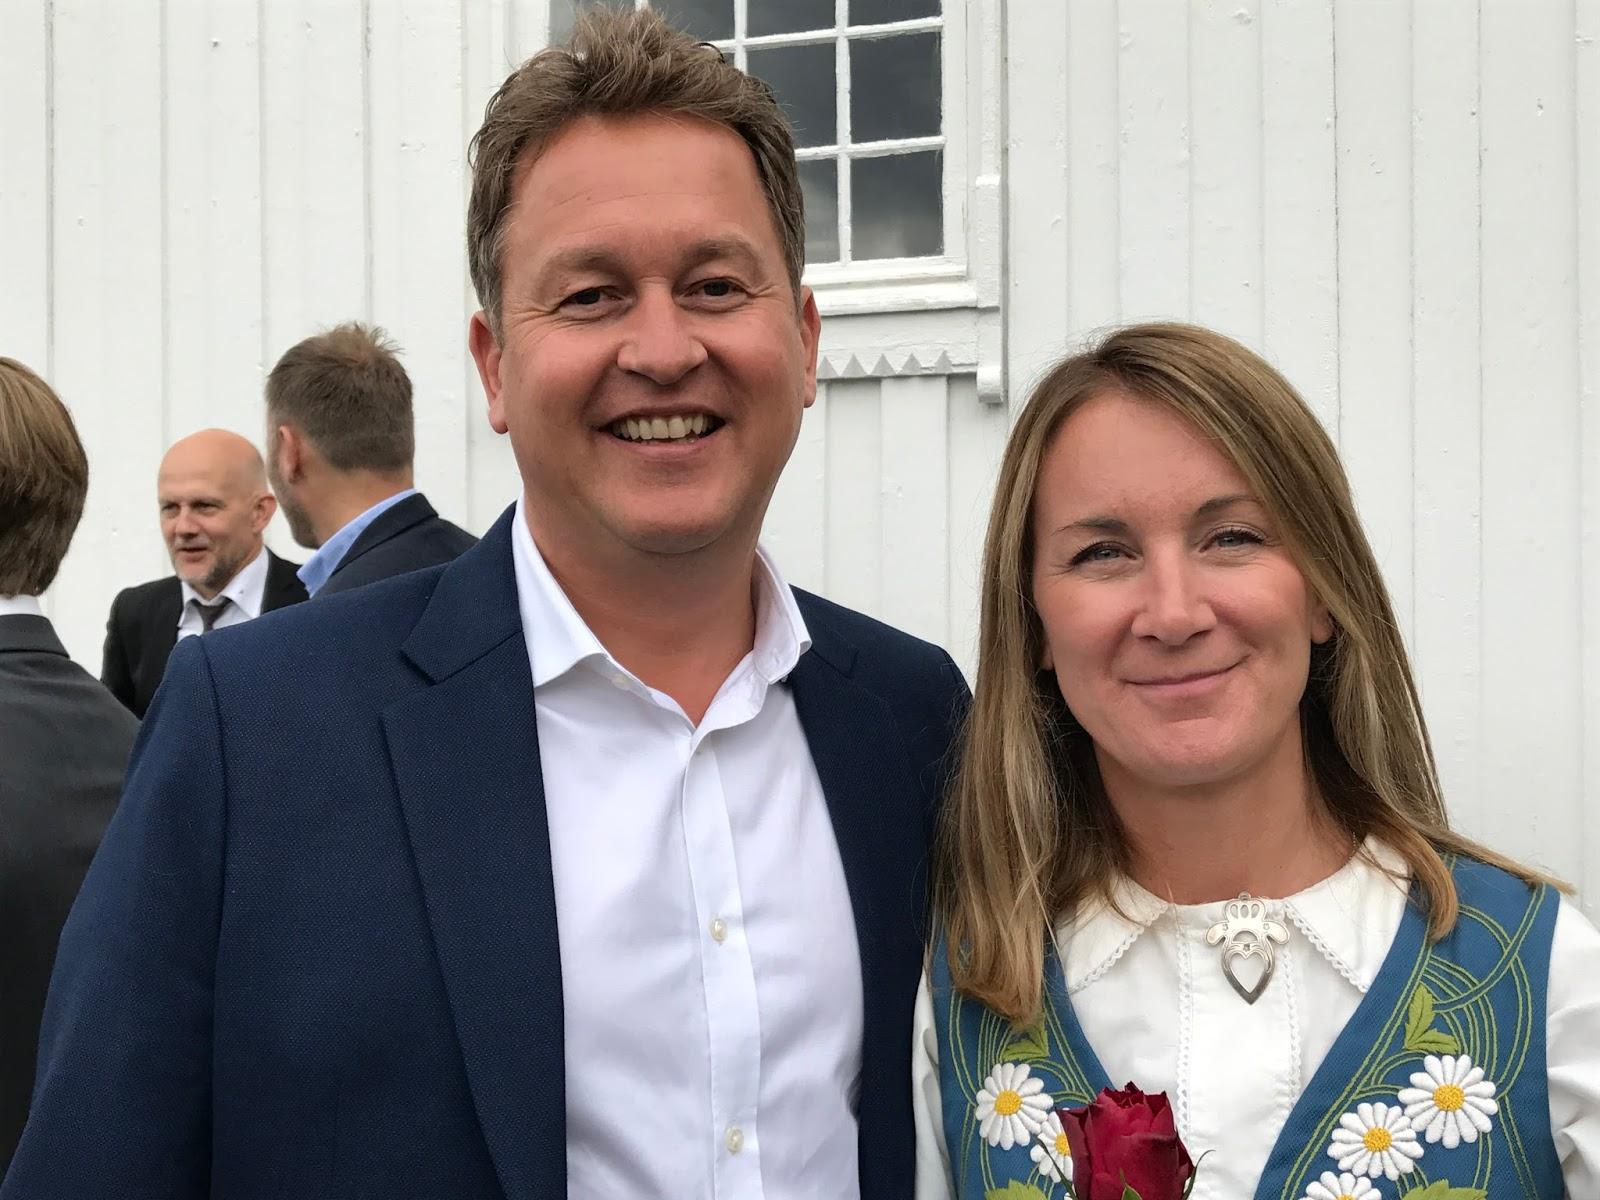 svenska amatörer porr transparenta trosor